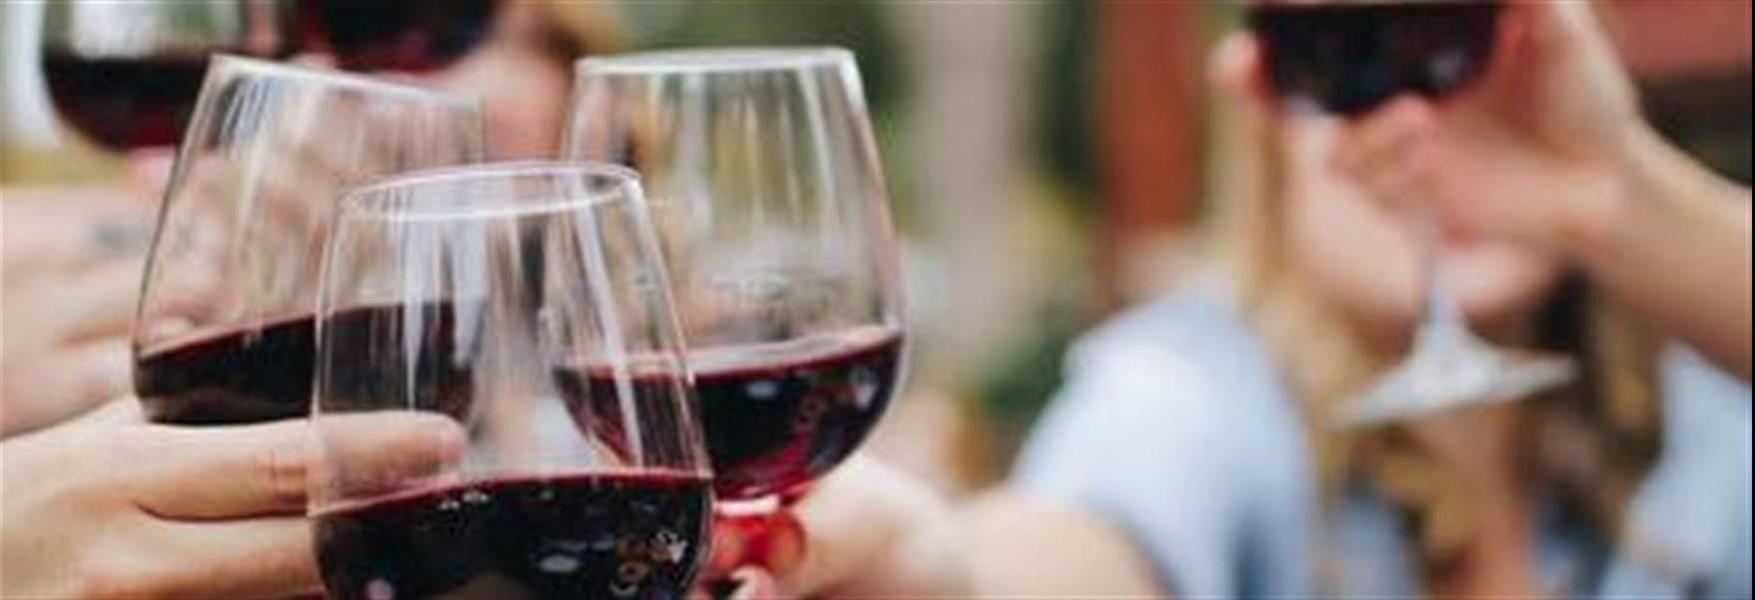 70e4d92b-8b9e-4188-8d20-eb9fc9e51a02_272692ba-2349-492a-83e2-a40ba89510c1_wine toast.jpg